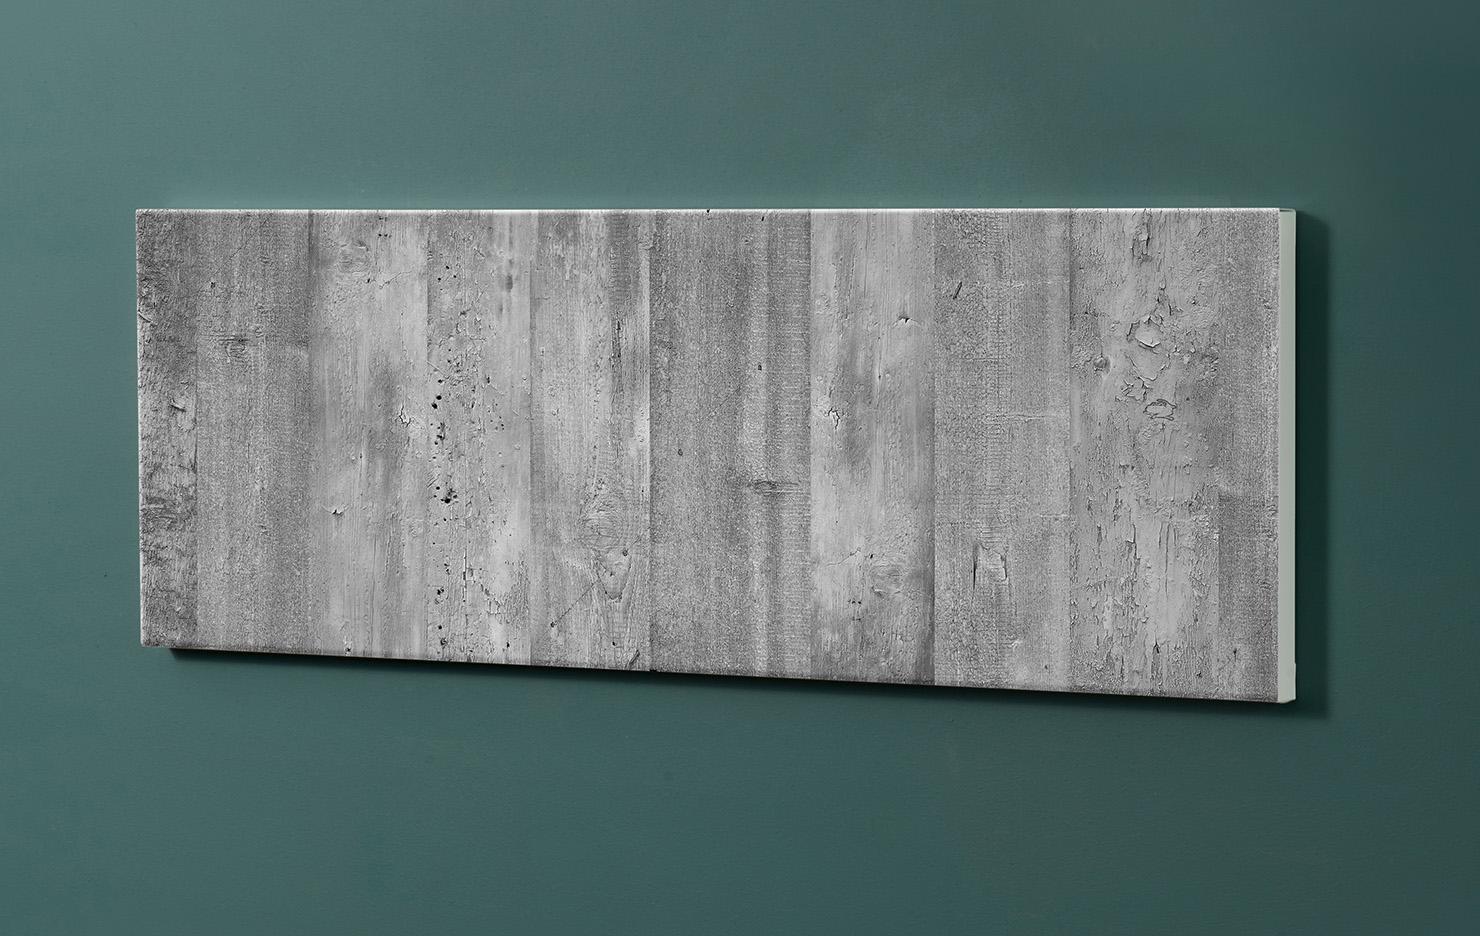 Magnettafel NOTIZ 90x30cm Motiv-Pinnwand M127 Beton